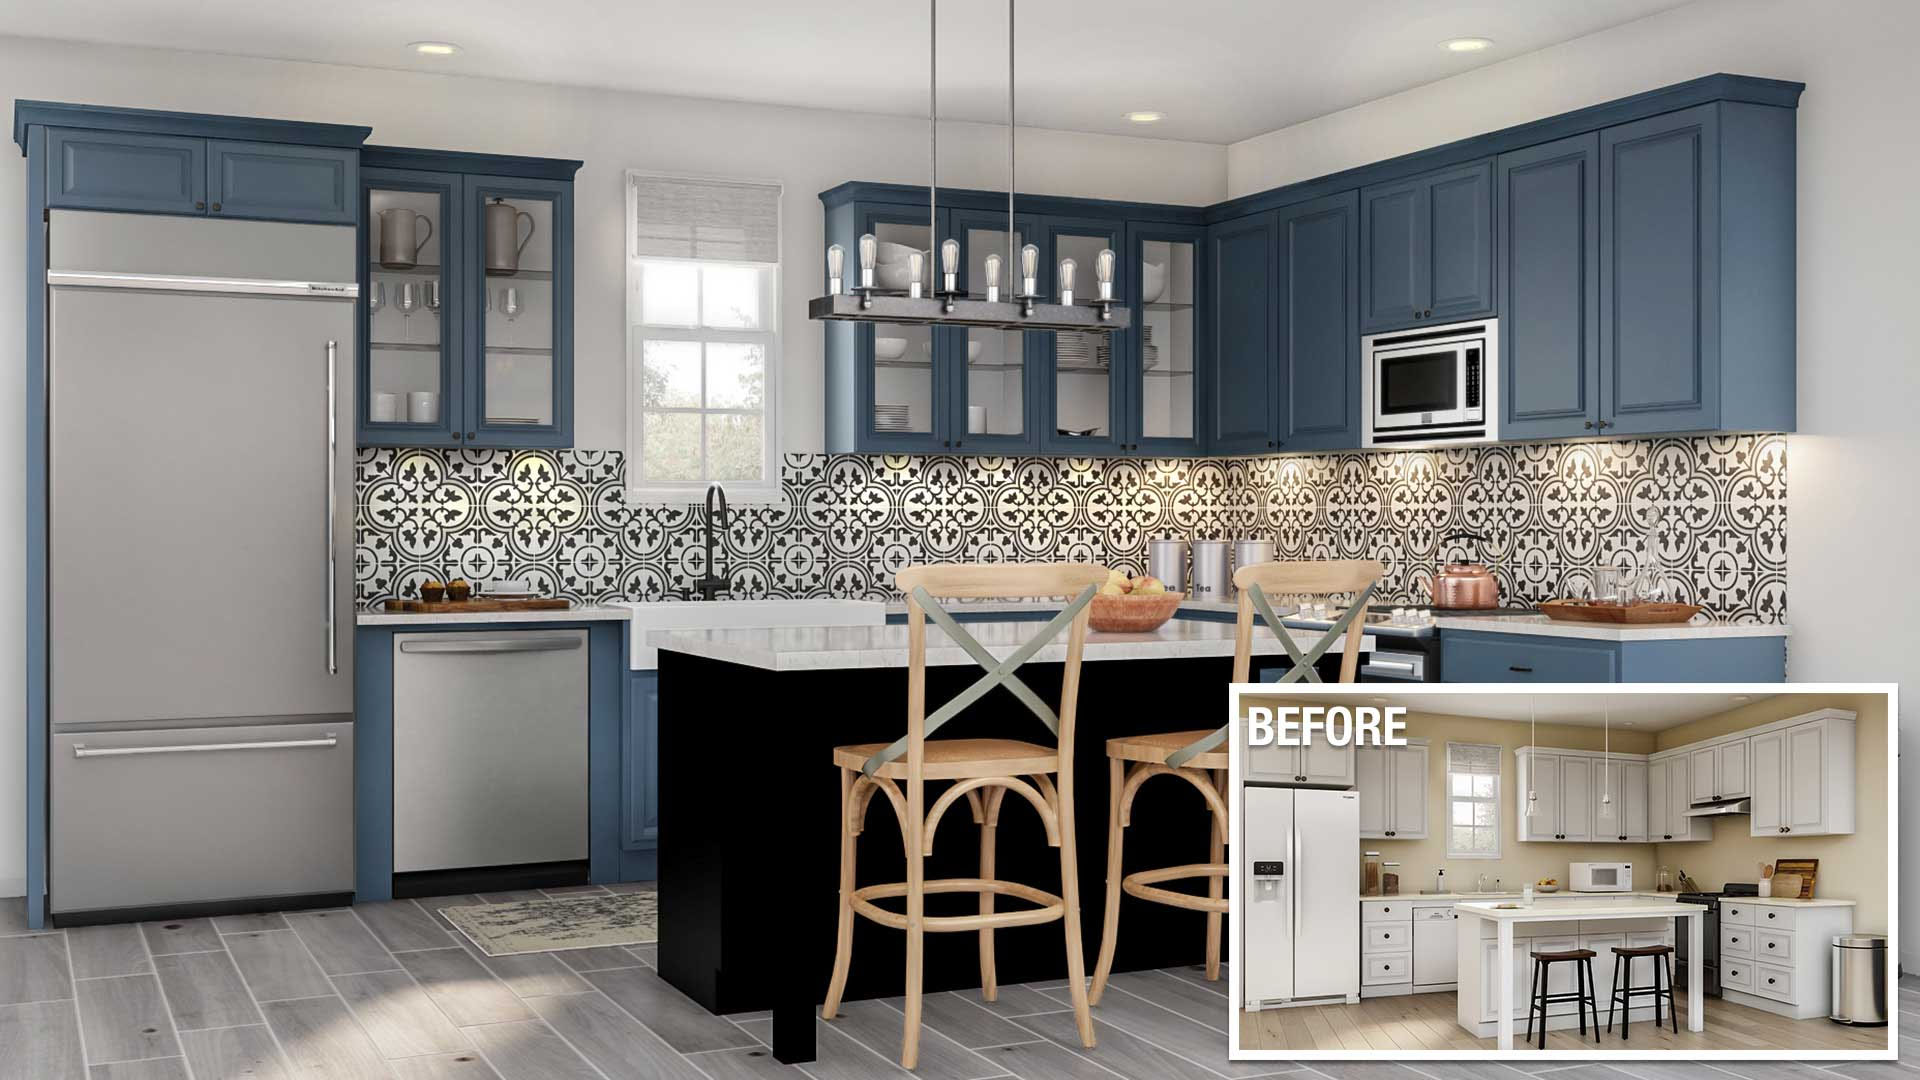 Major kitchen remodel cost in Orange County ca